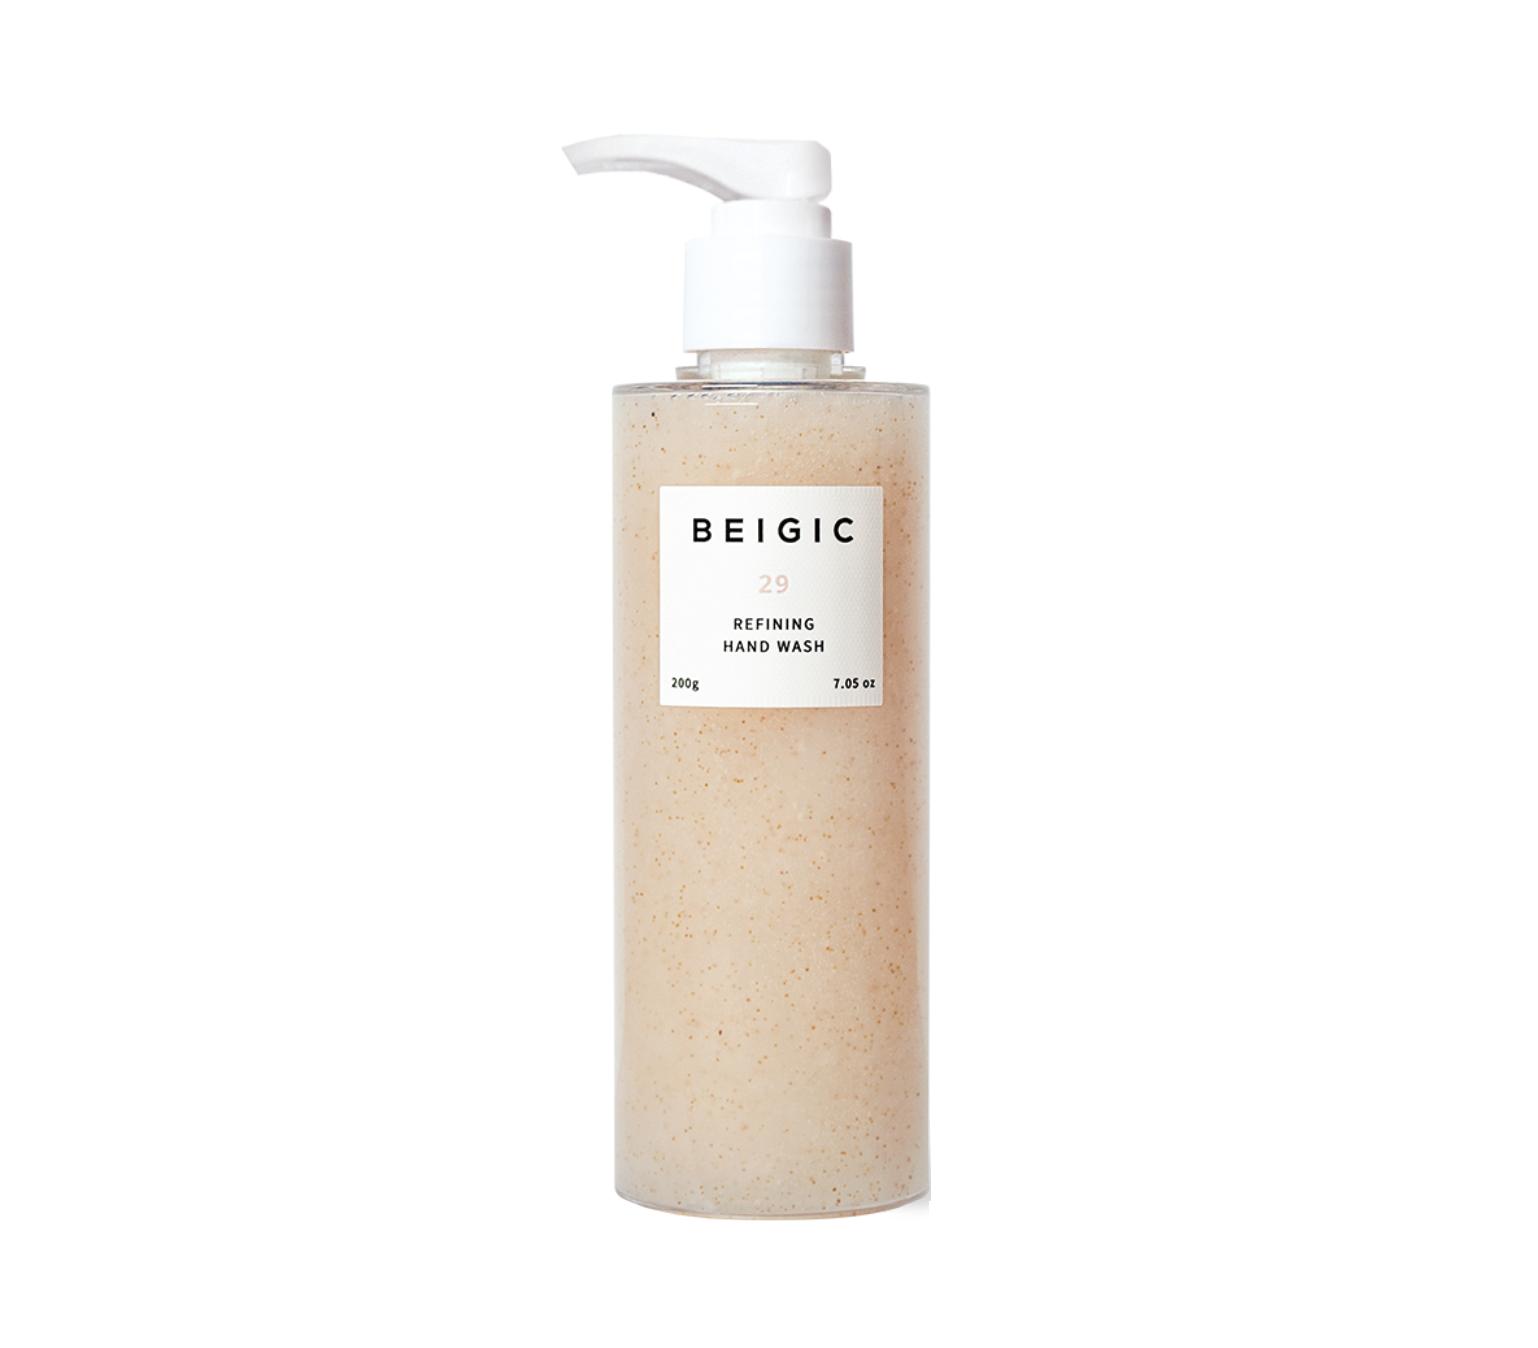 beigic-refining-hand-wash-avis-revue